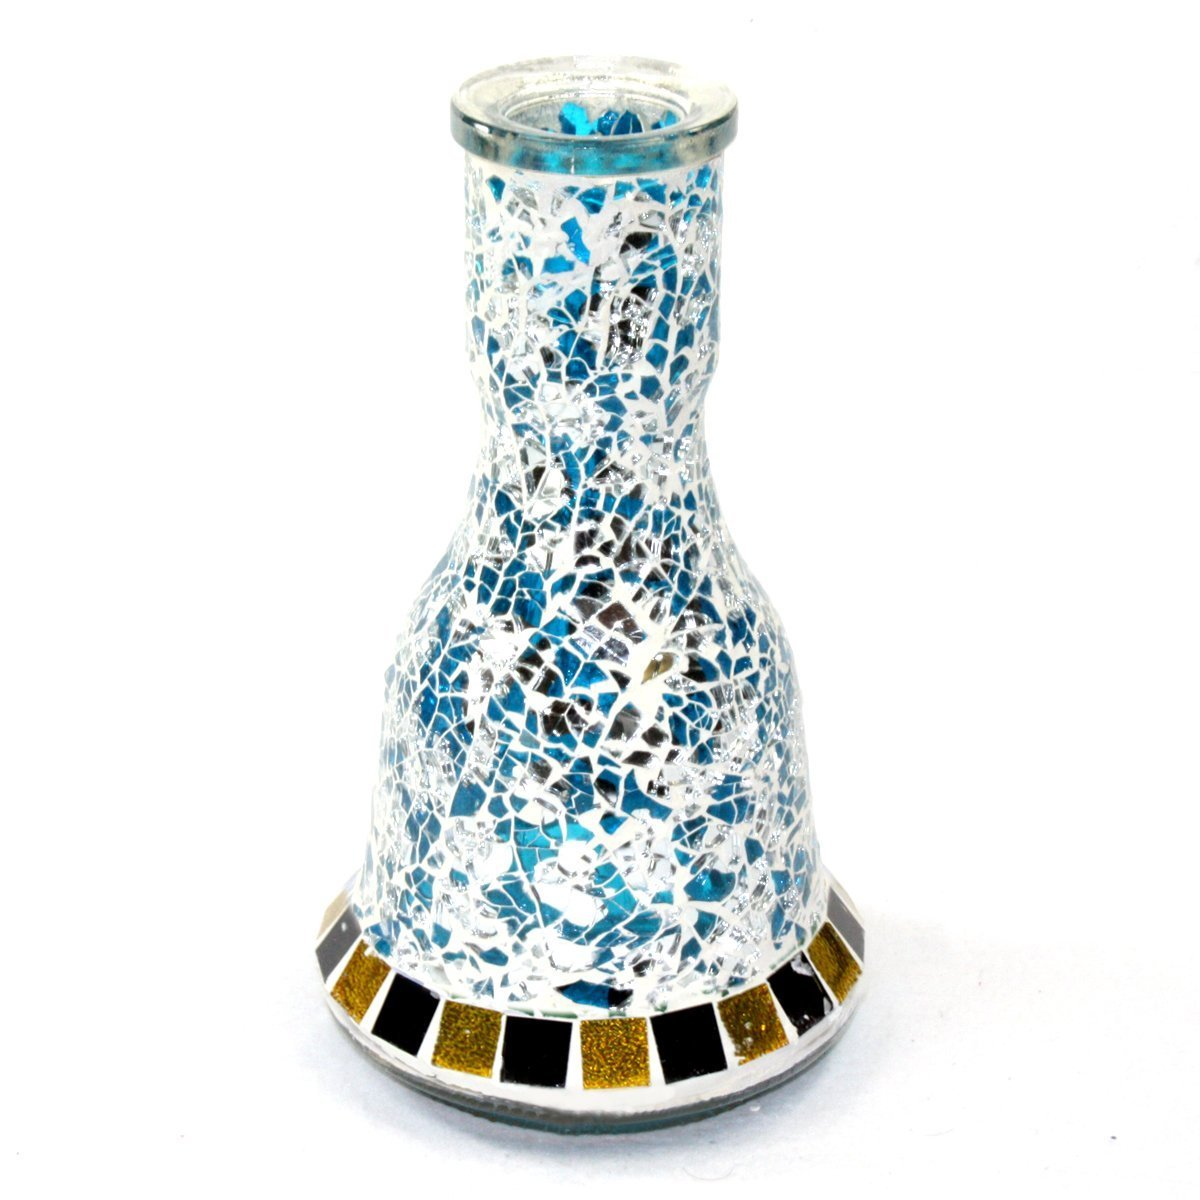 GStar Deluxe Series: 20'' 2 Hose Hookah Complete Set w/ Travel Case - Mosaic Tile Art Glass Vase - Pick Your Color (Blue w/ Case) by GSTAR Hookah (Image #2)